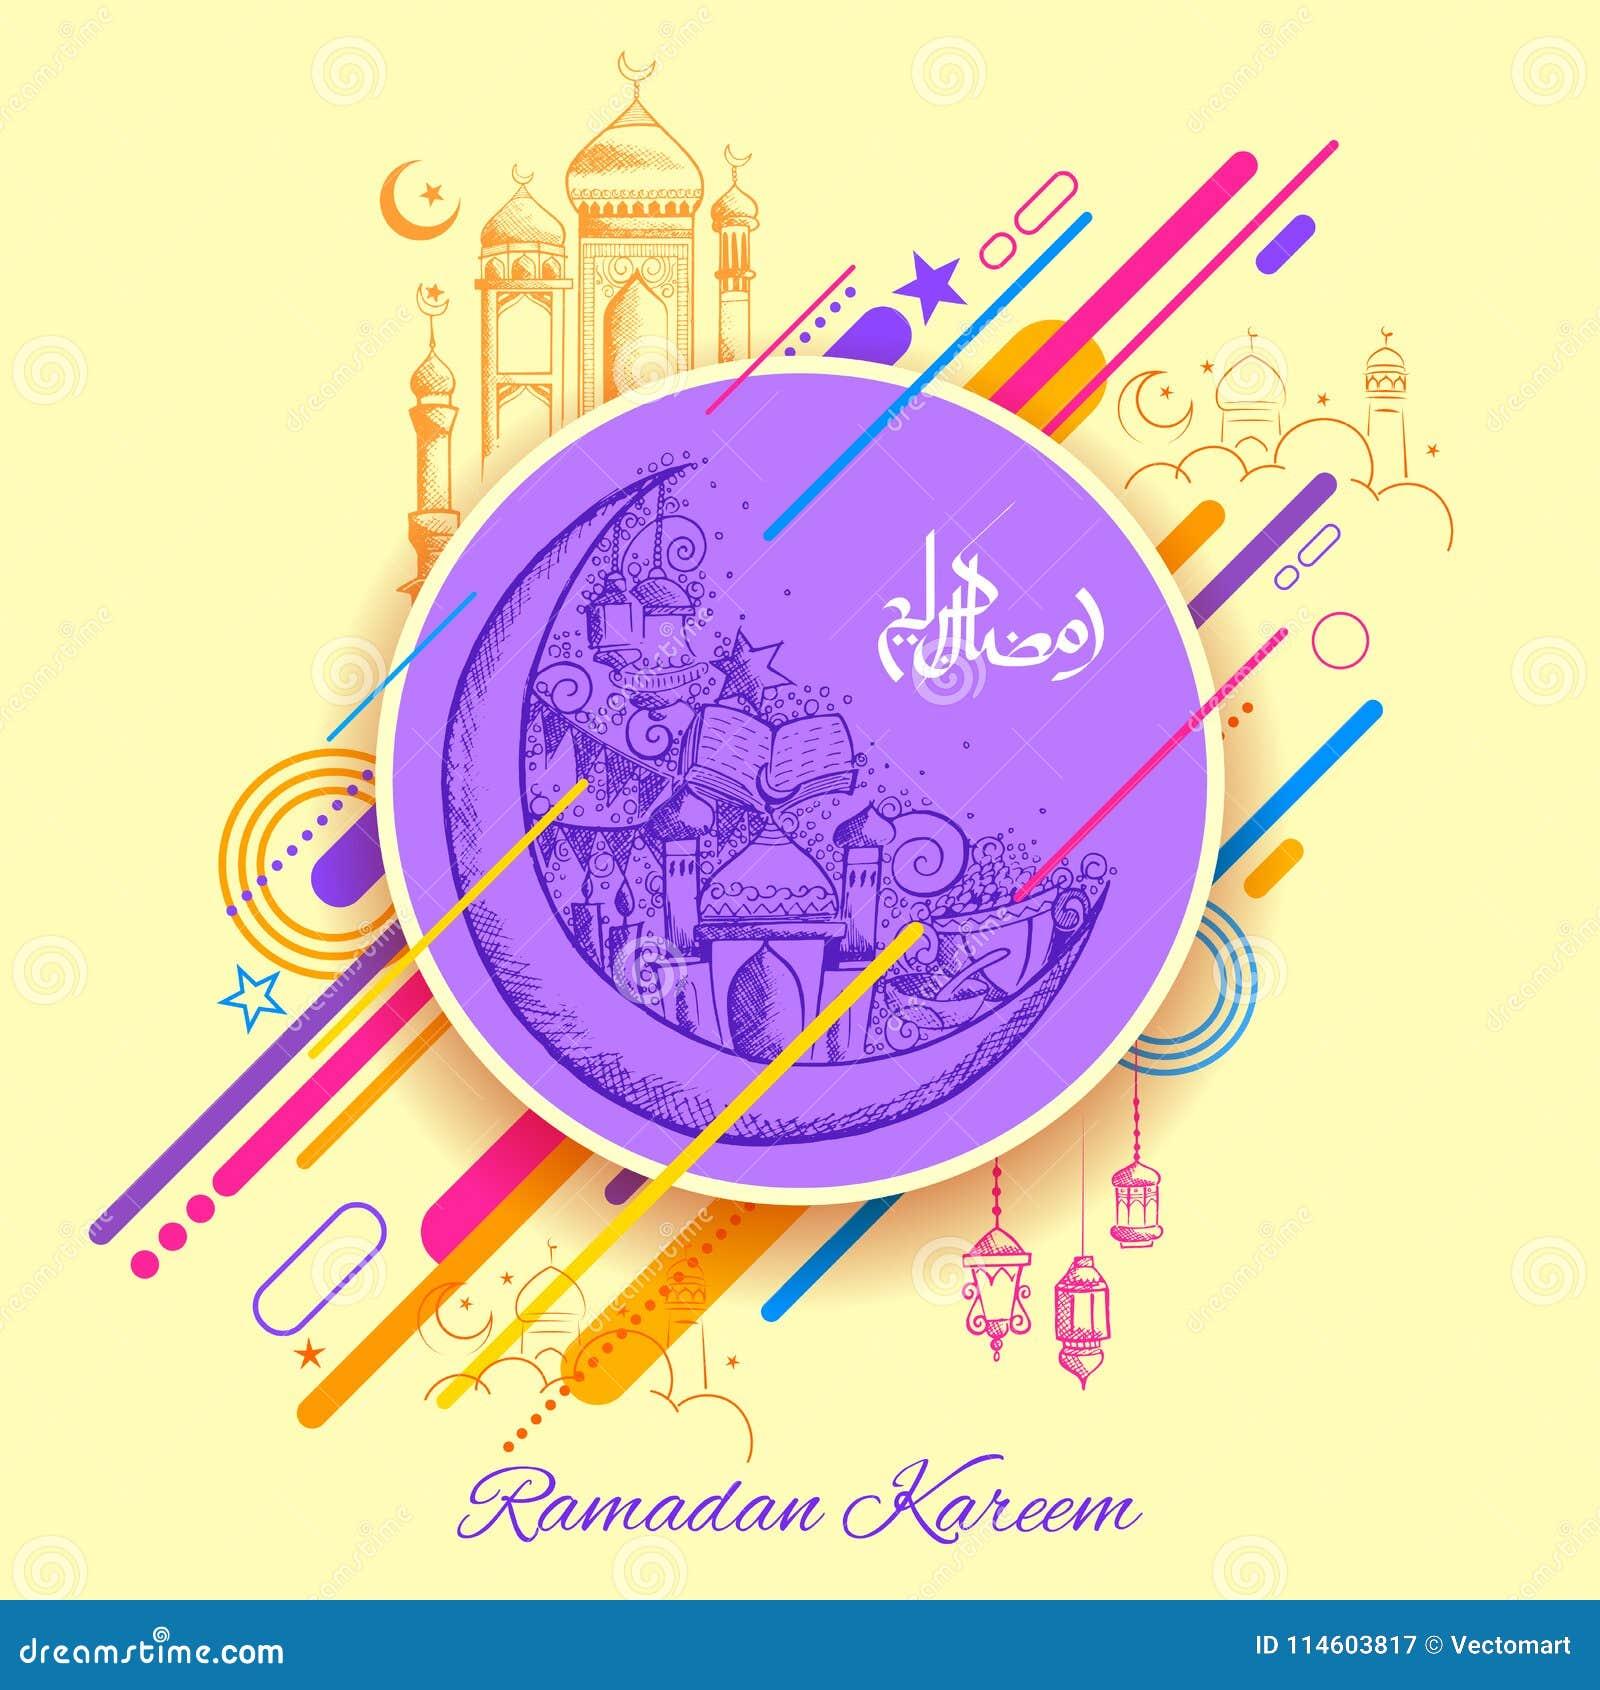 Ramadan Kareem Generous Ramadan Greetings In Arabic Freehand